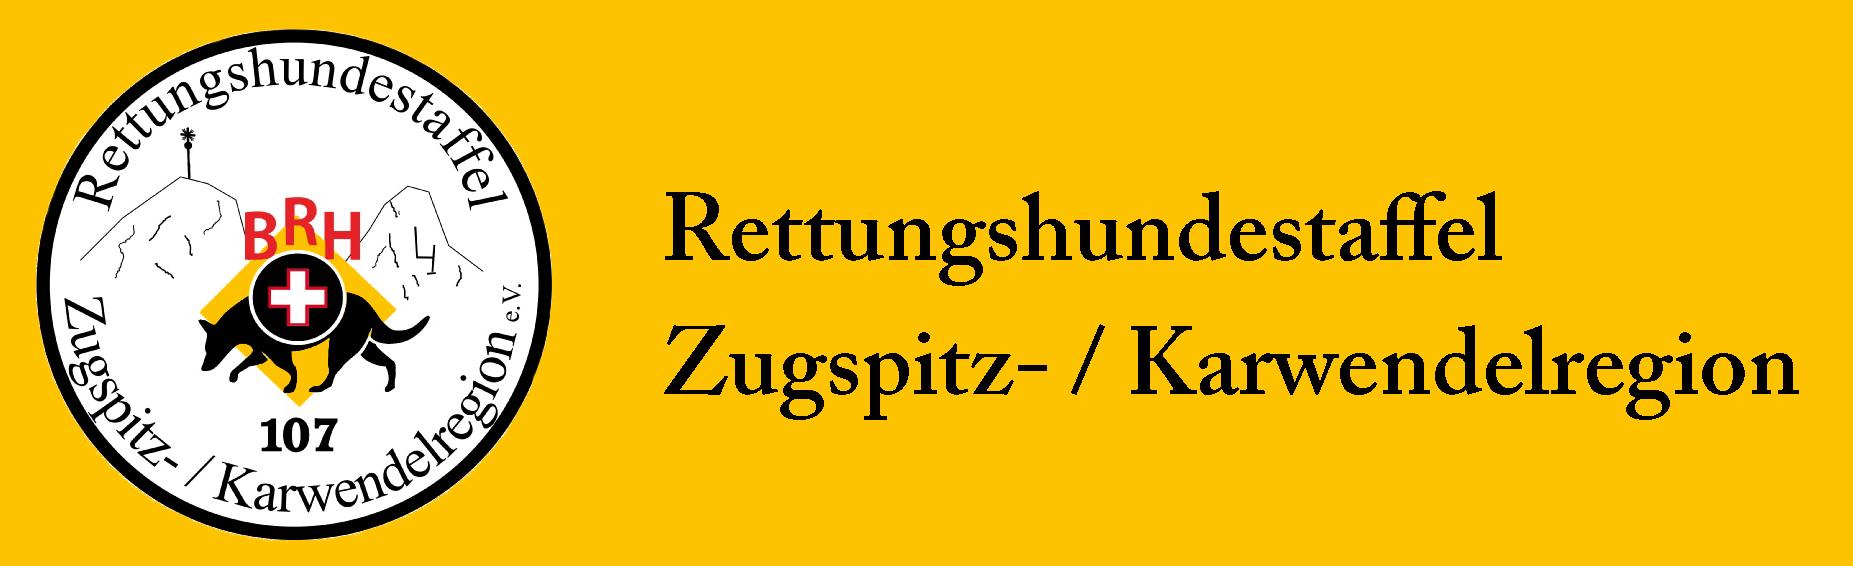 Rettungshundestaffel Garmisch-Partenkirchen